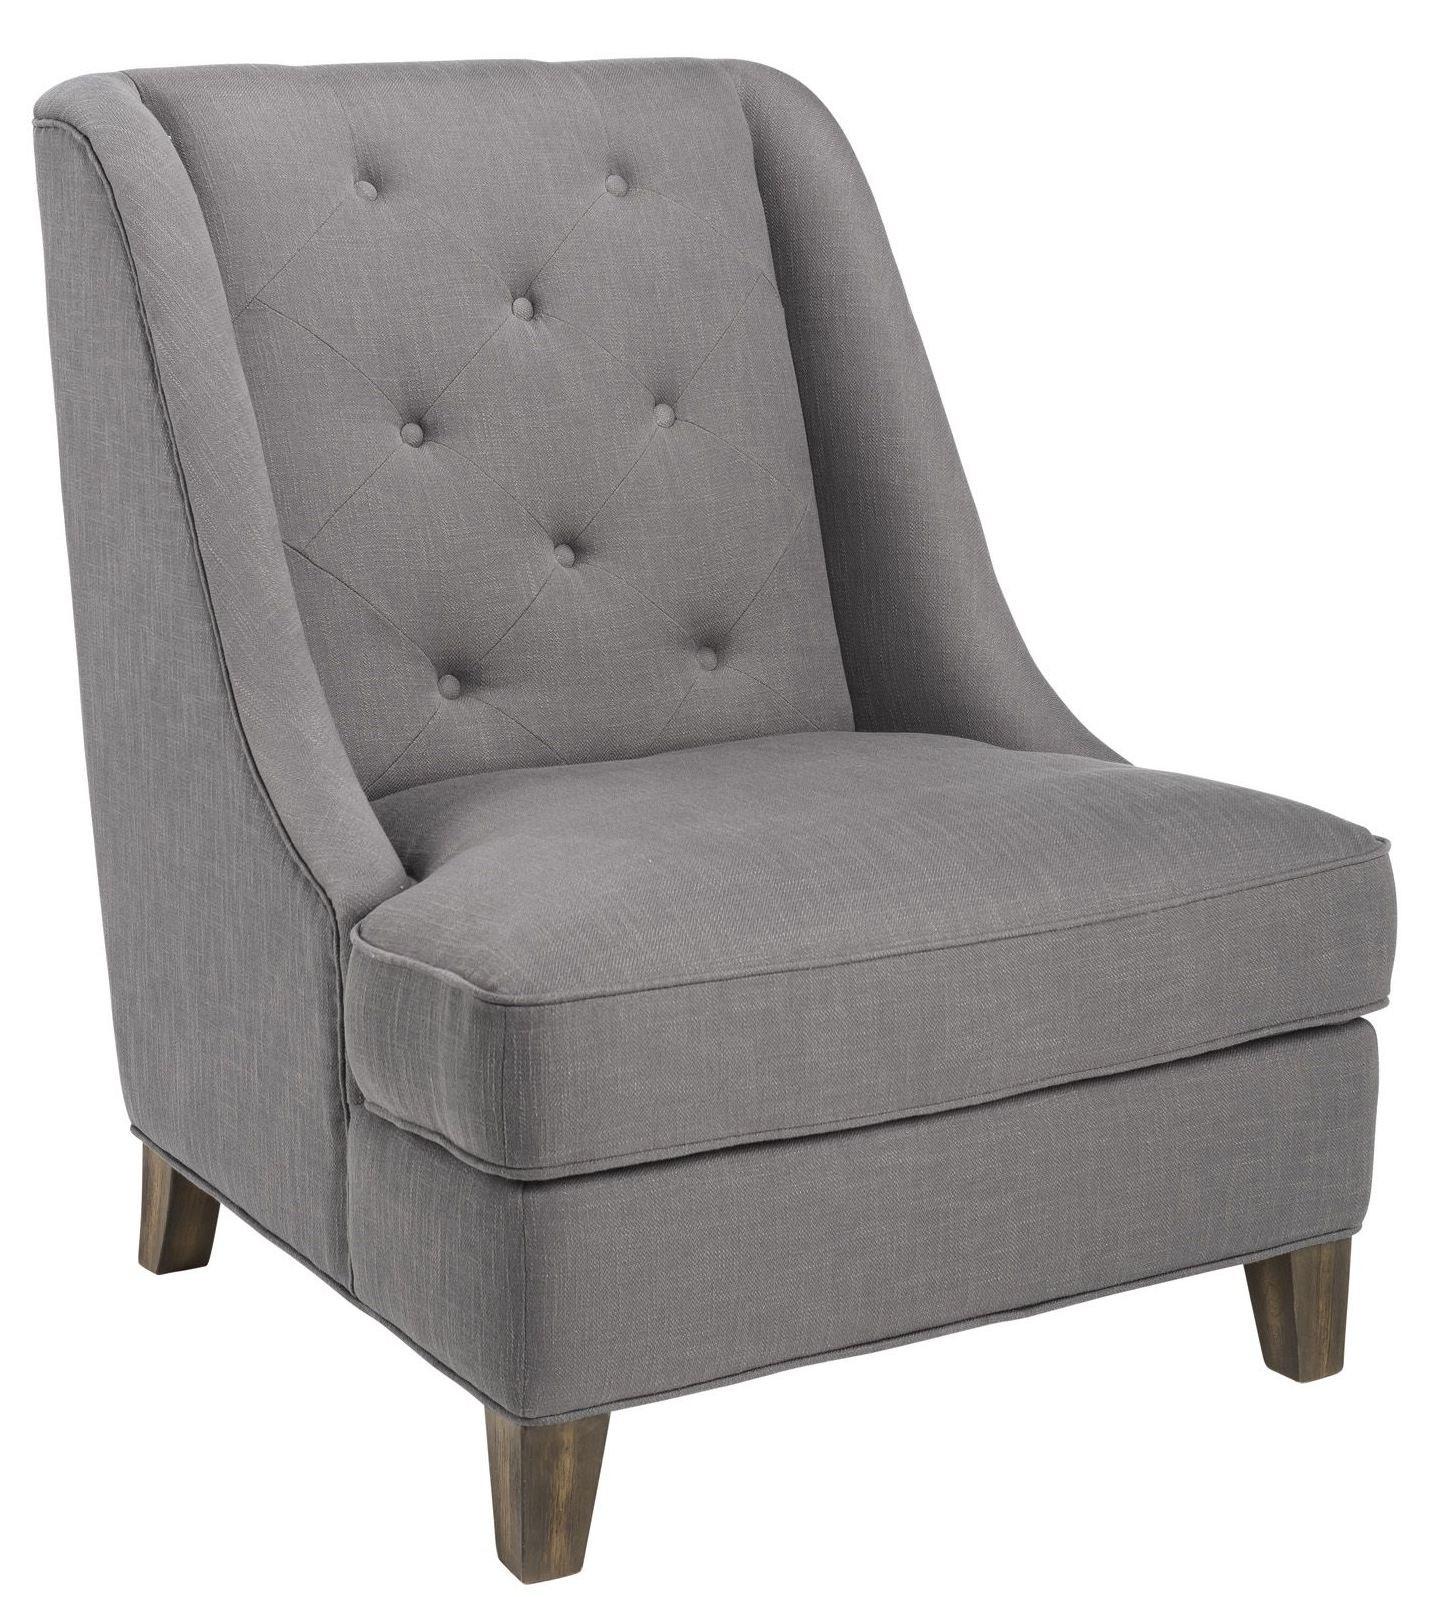 Selfridge Rhino Grey Fabric Armchair from Sunpan | Coleman ...